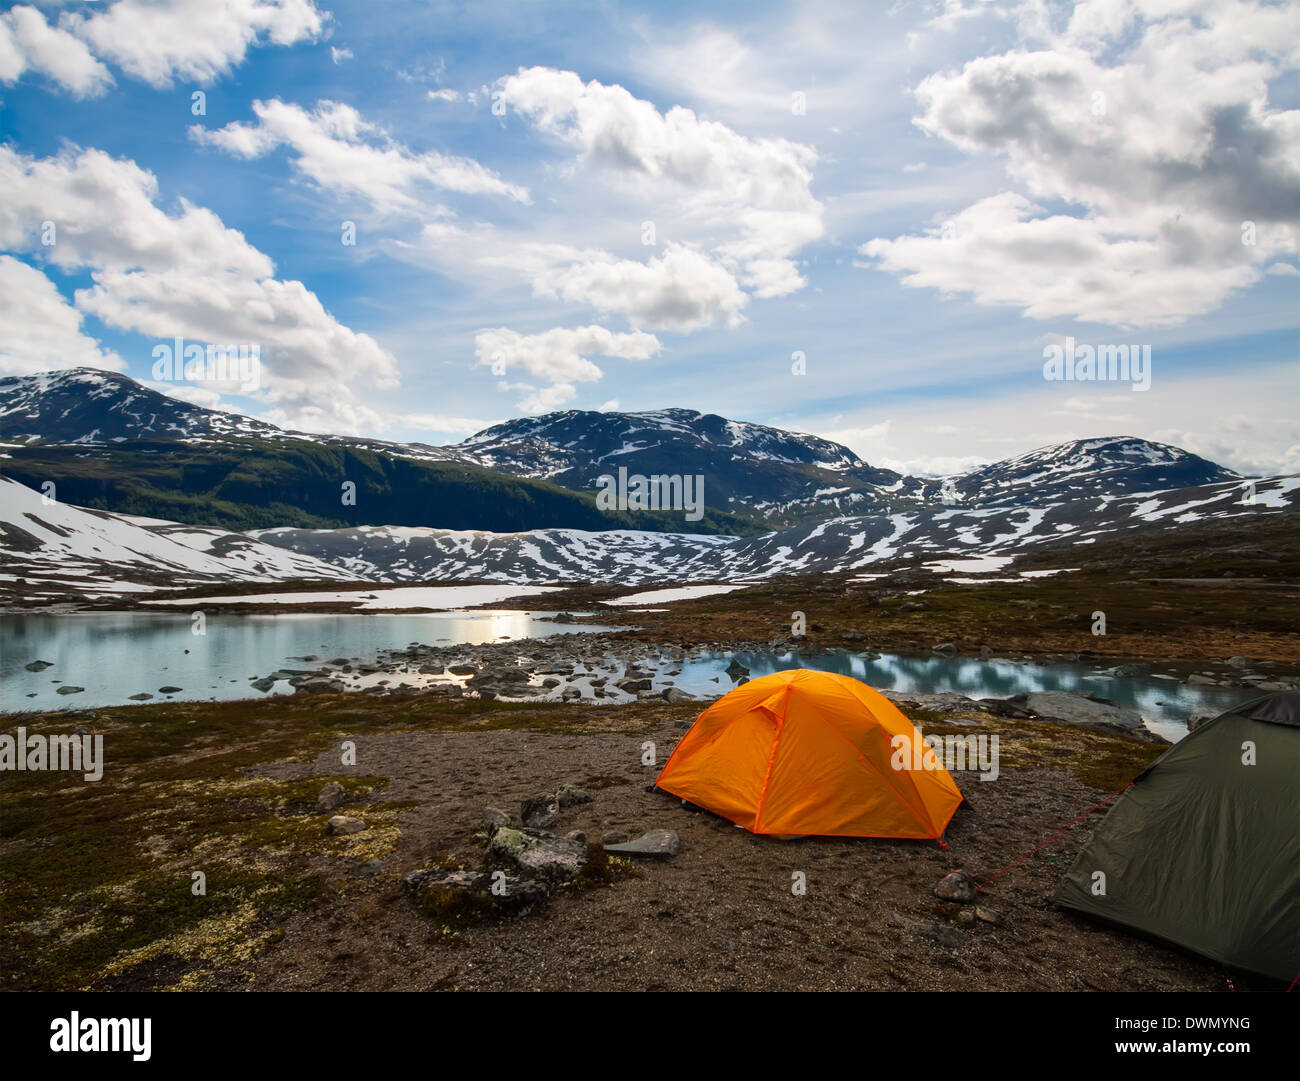 zwei touristische Zelte in Bergen, Norwegen Sommer Stockbild